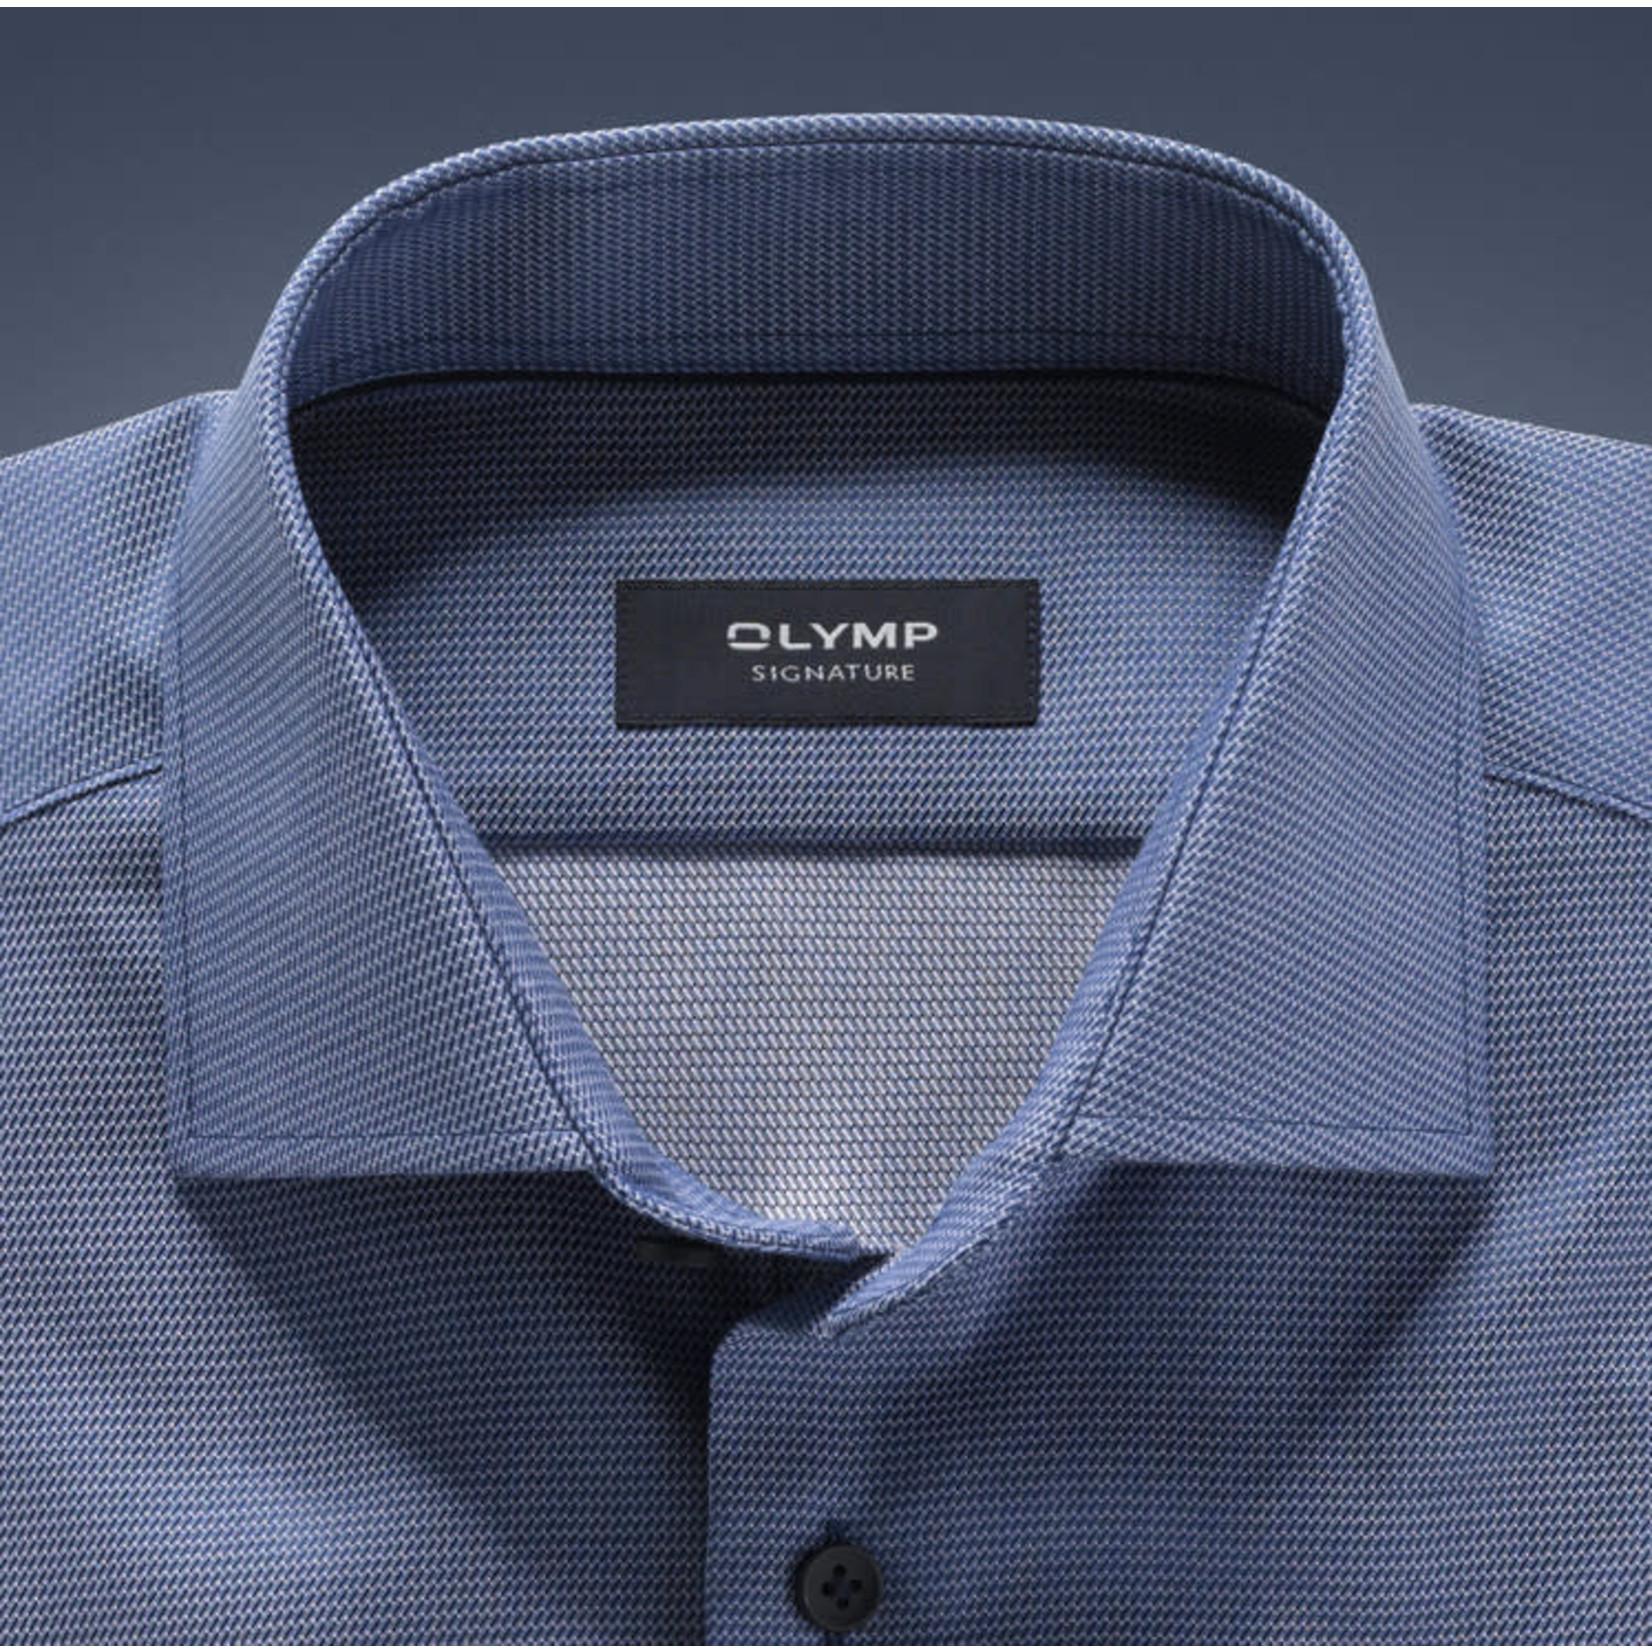 Olymp Signature tailored fit overhemd rookblauw